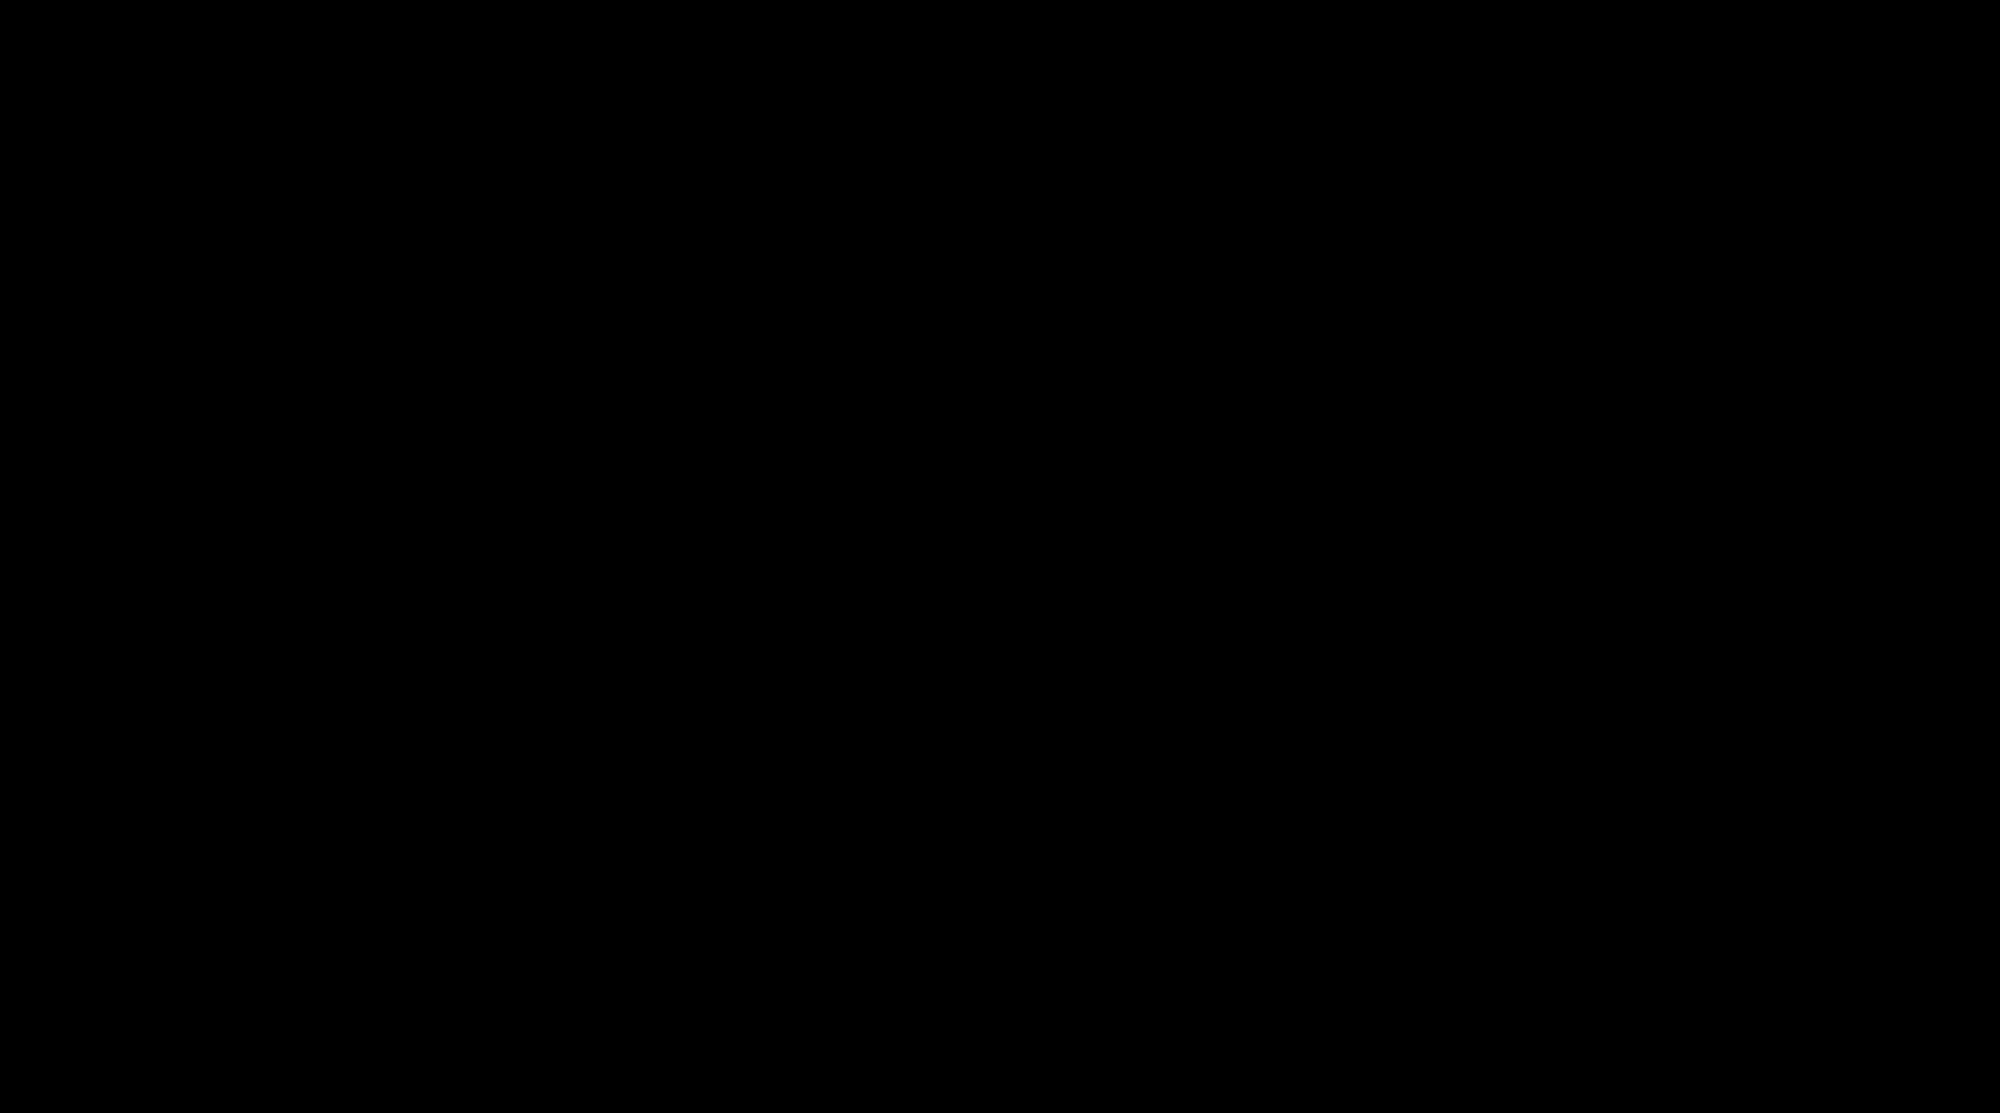 monitor black.png